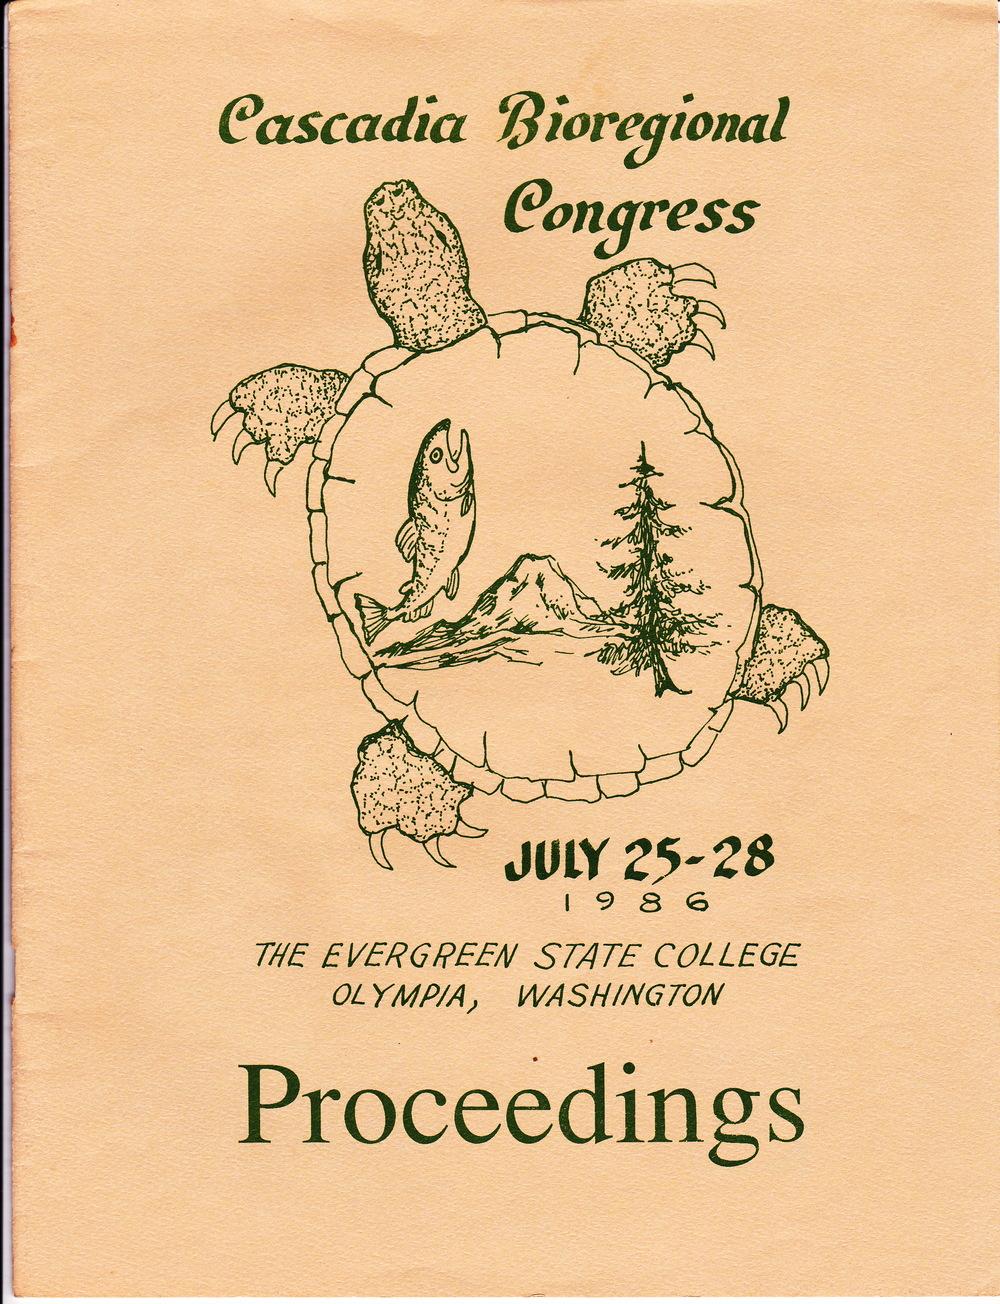 Cascadia+Bioregional+Congress+1986.jpg